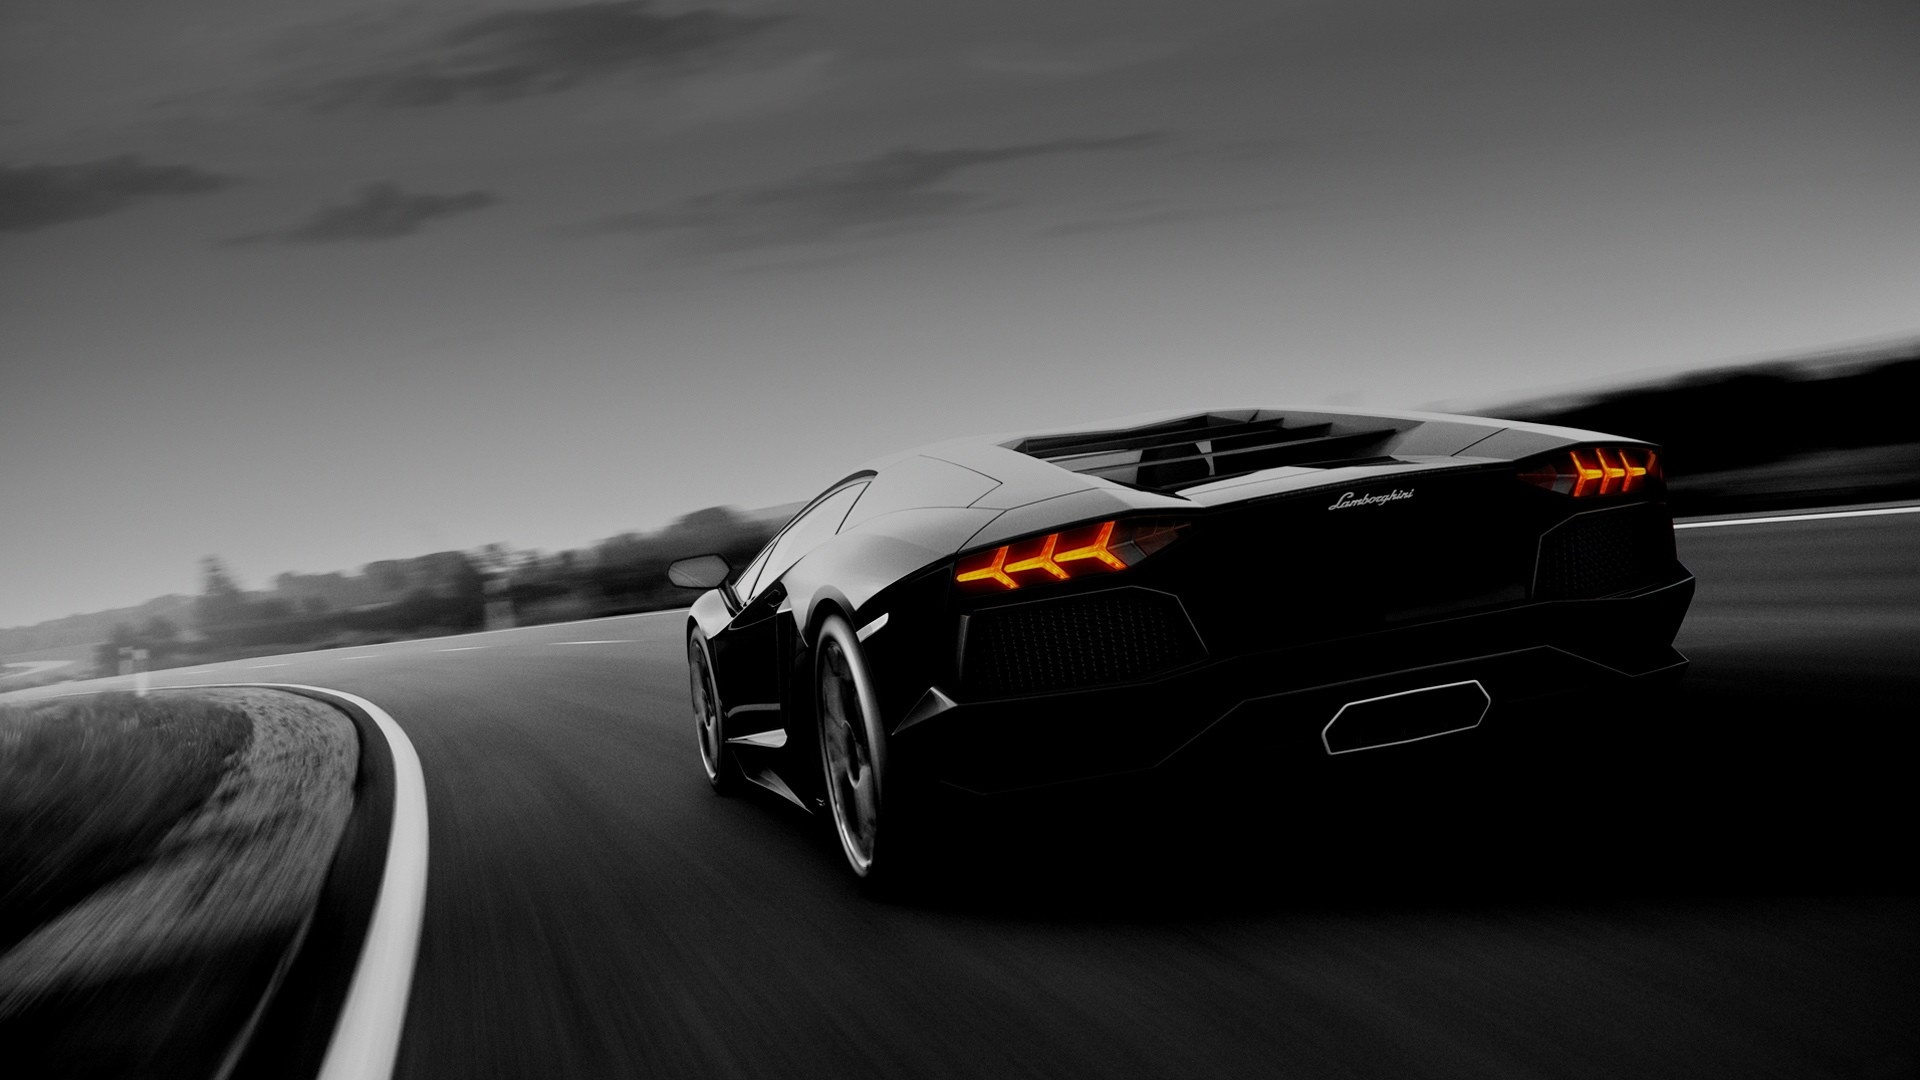 ... Lamborghini Aventador Lamborghini Aventador